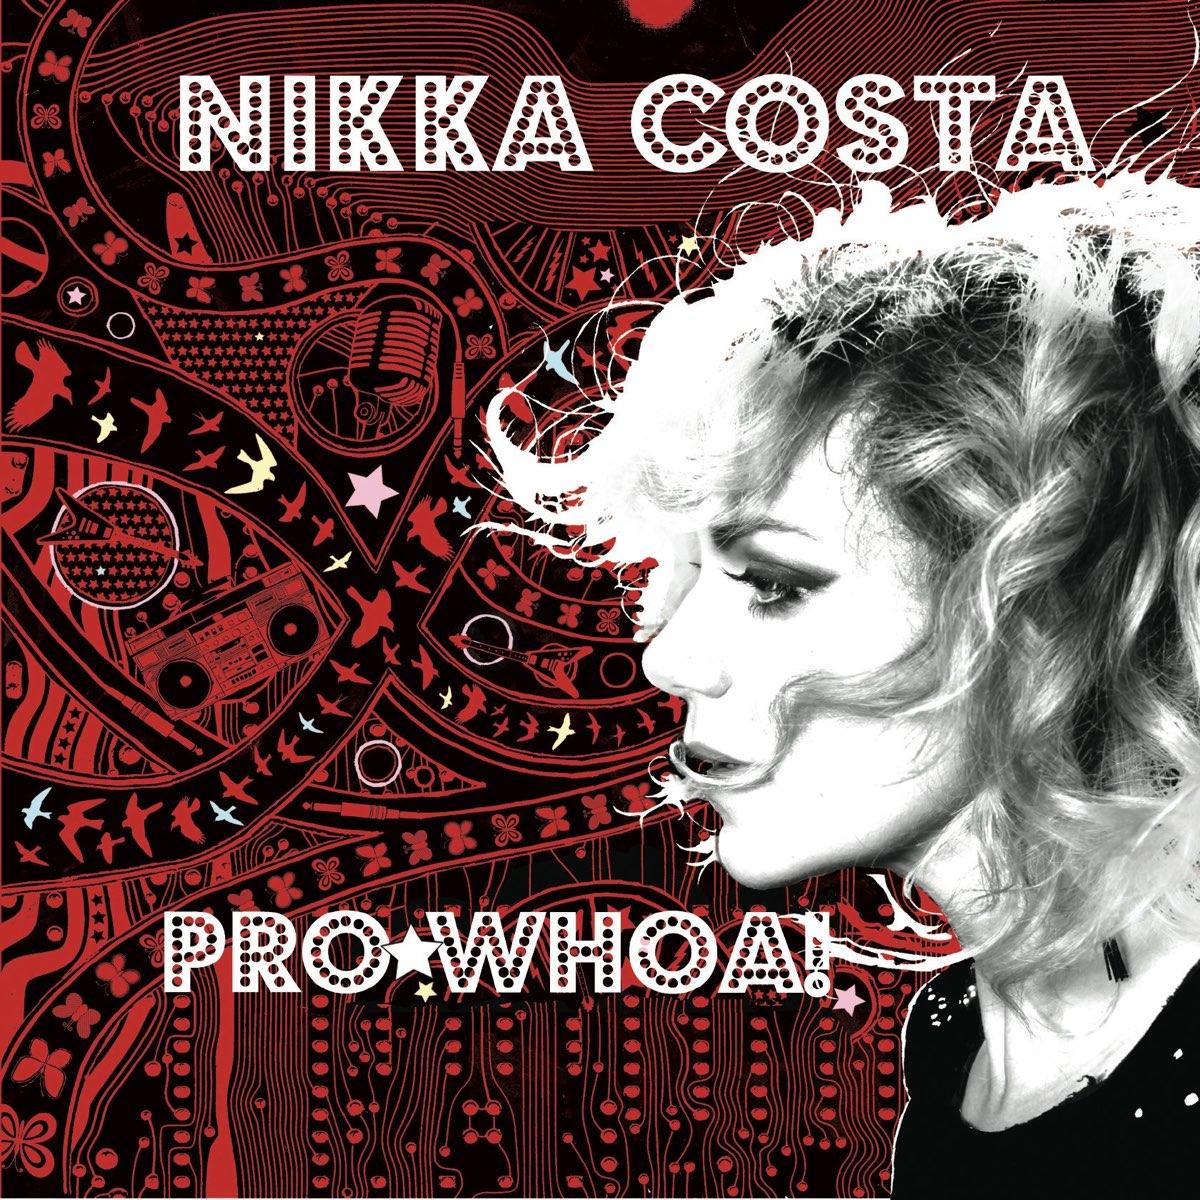 Nikka Costa, Pro*Whoa!